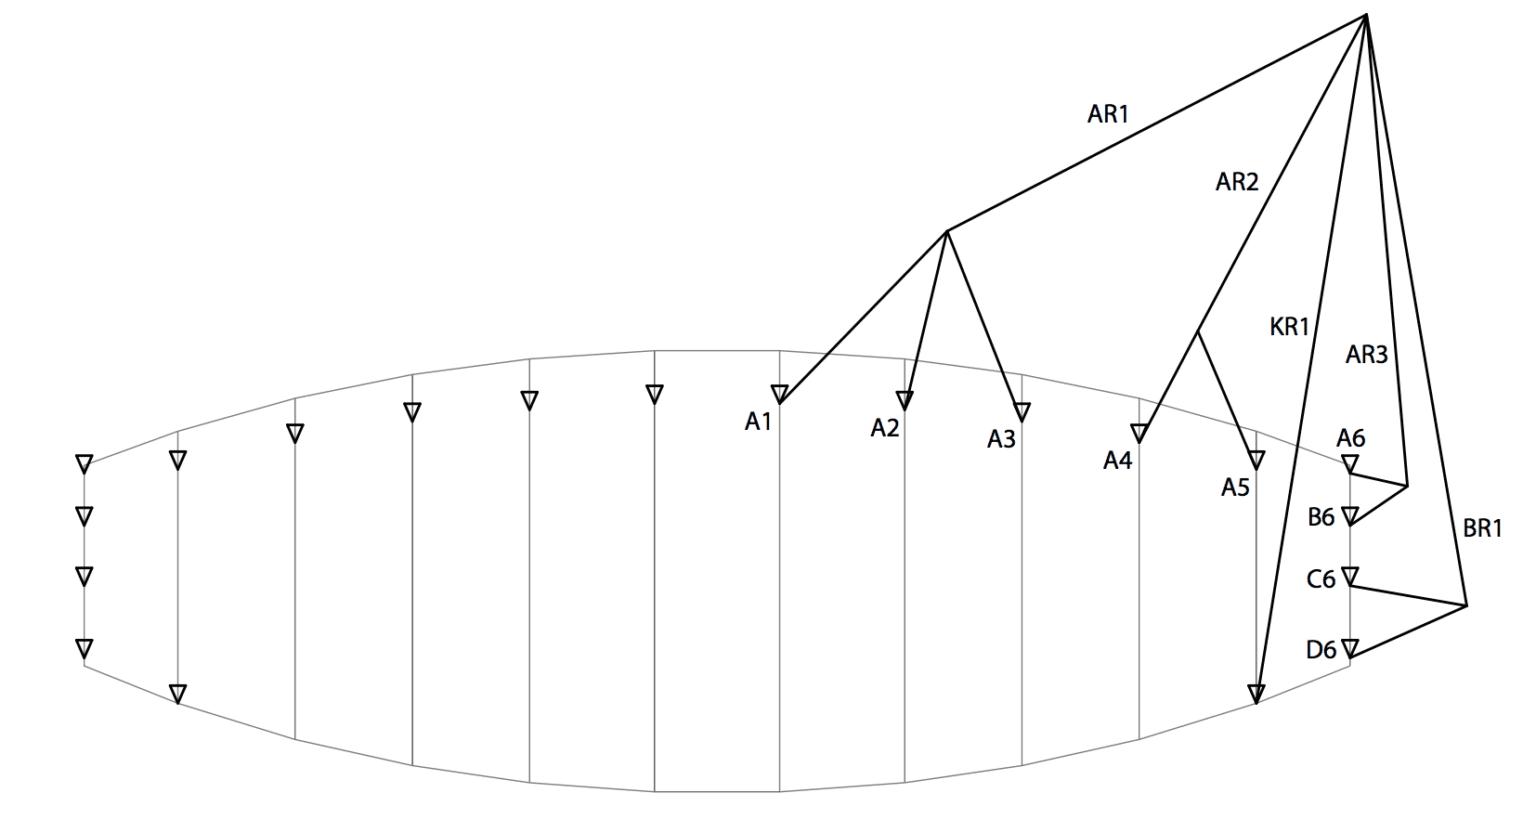 Plan de bridage Go V1 d'Ozone kites / JKS-kitesurf